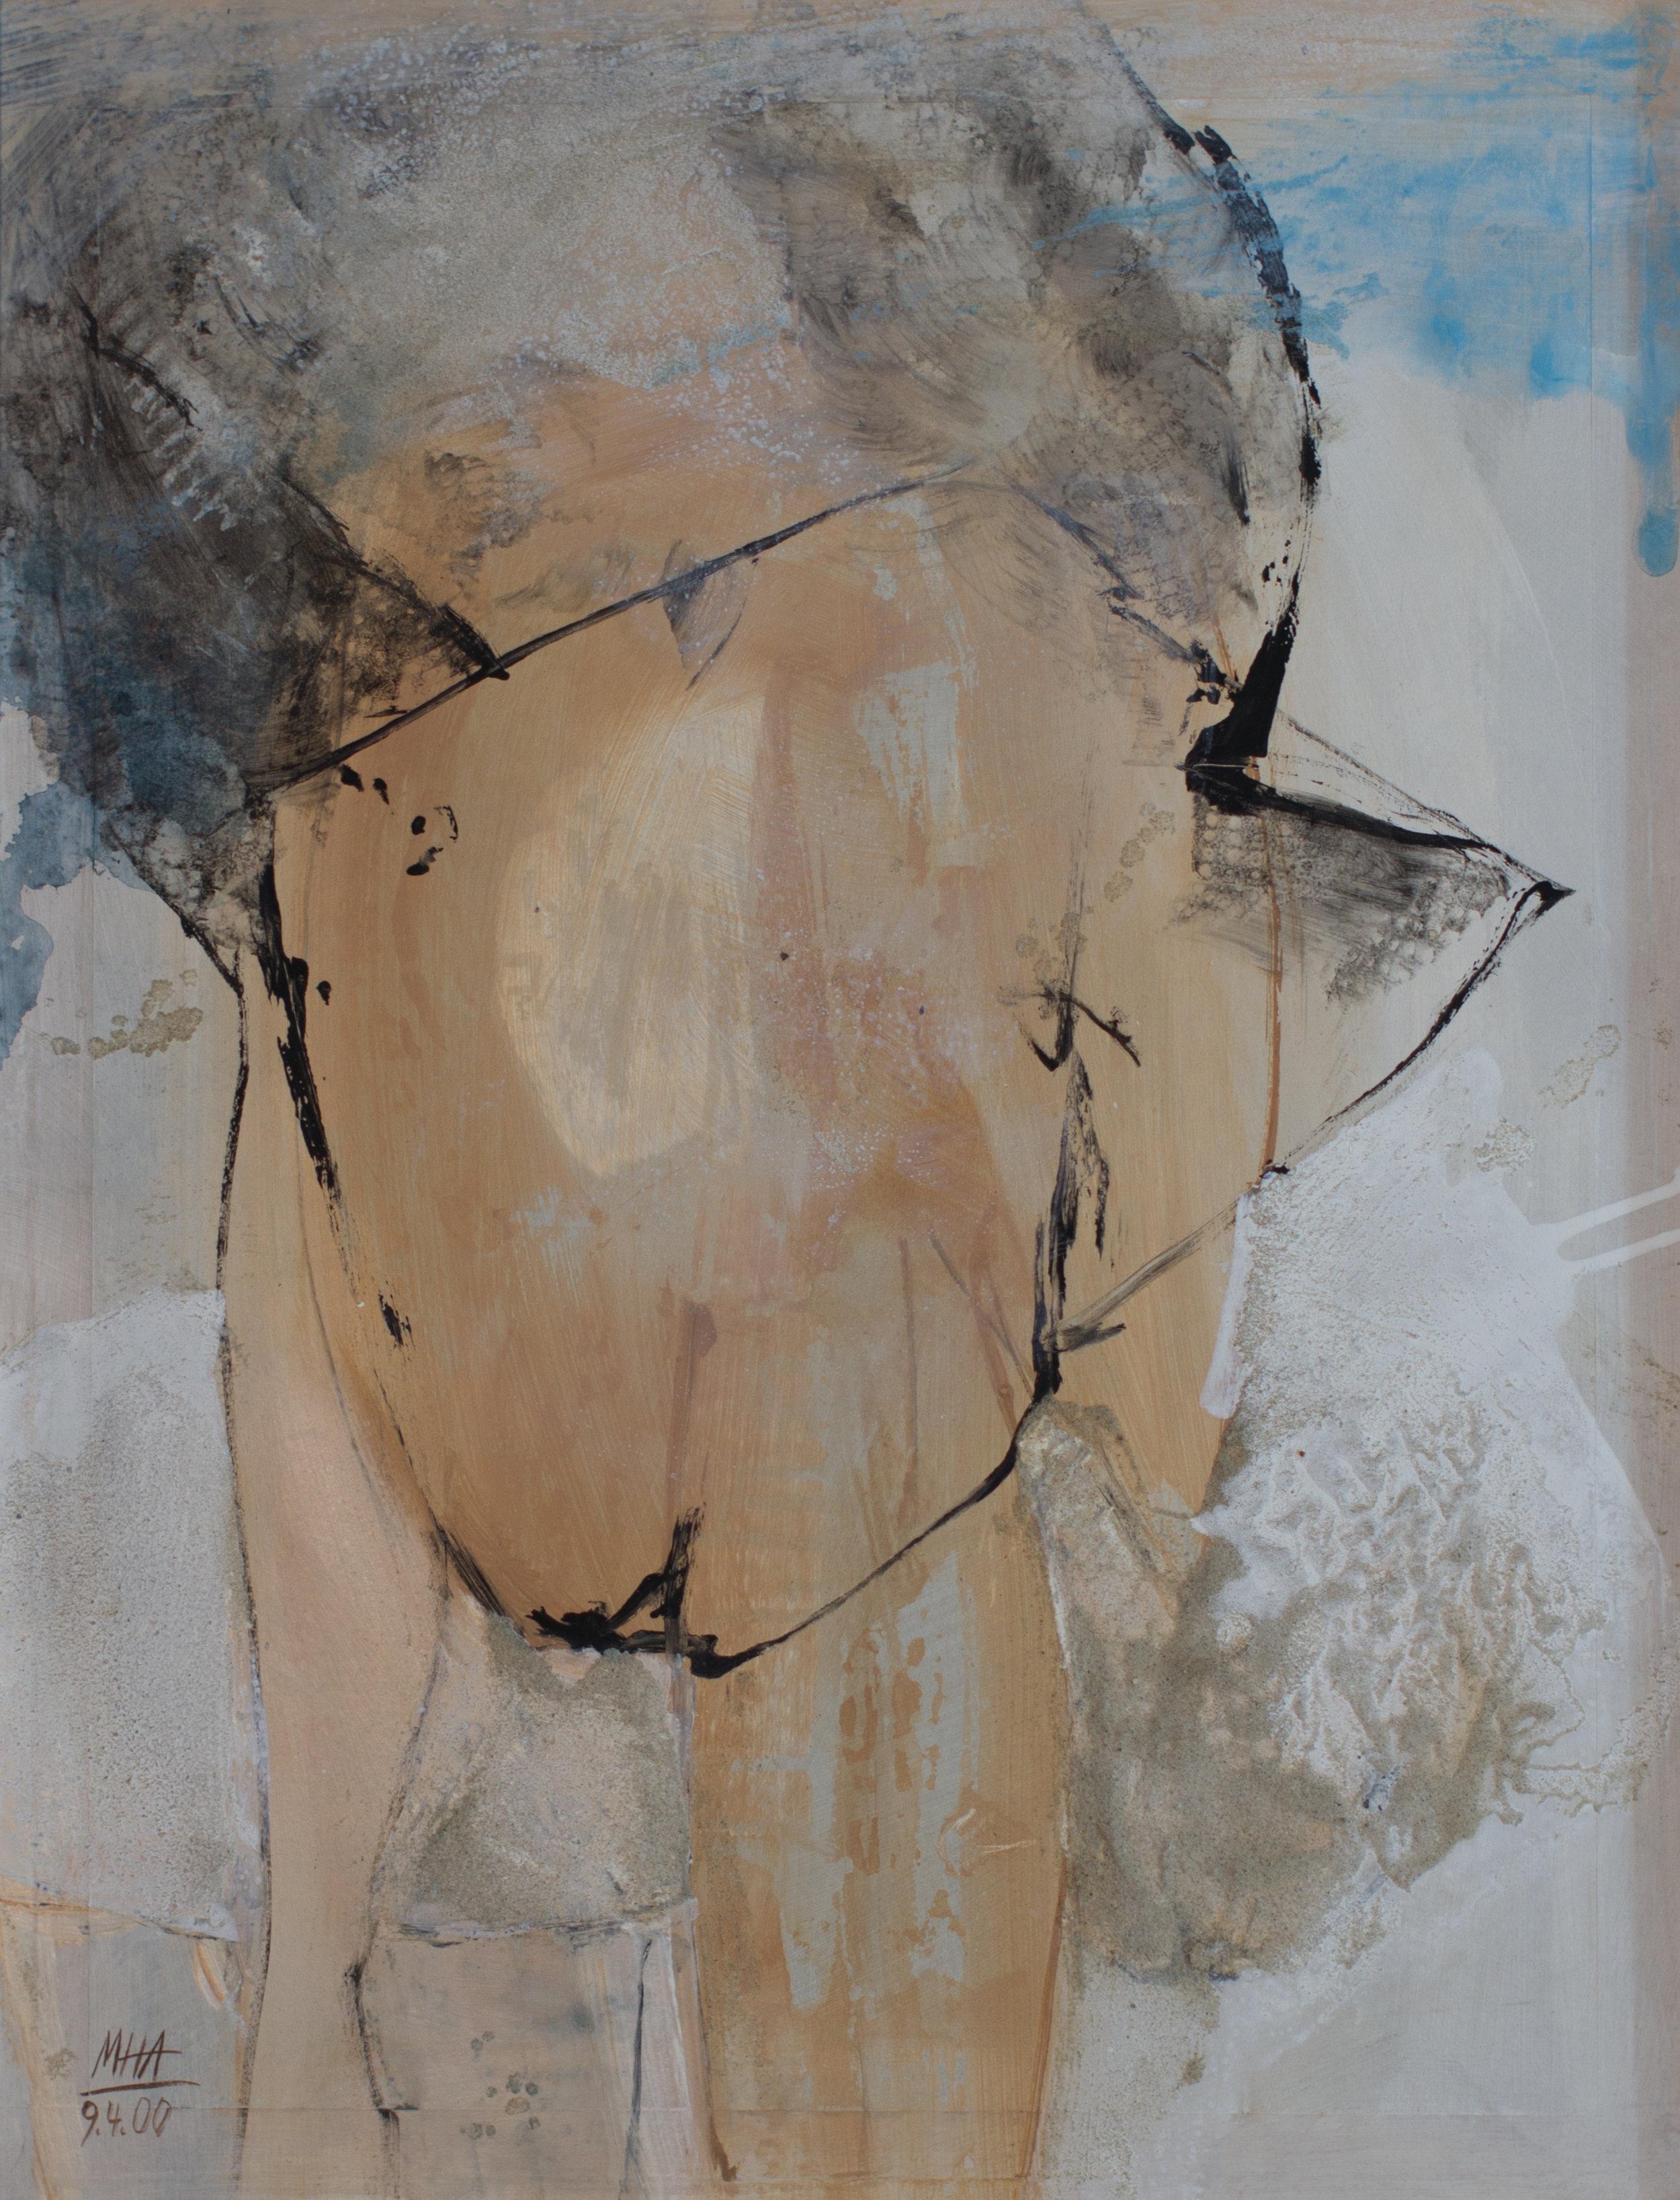 z.m.e Schaf , 2000,Acryl auf Papier - Mischtechnik, 53x69 cm